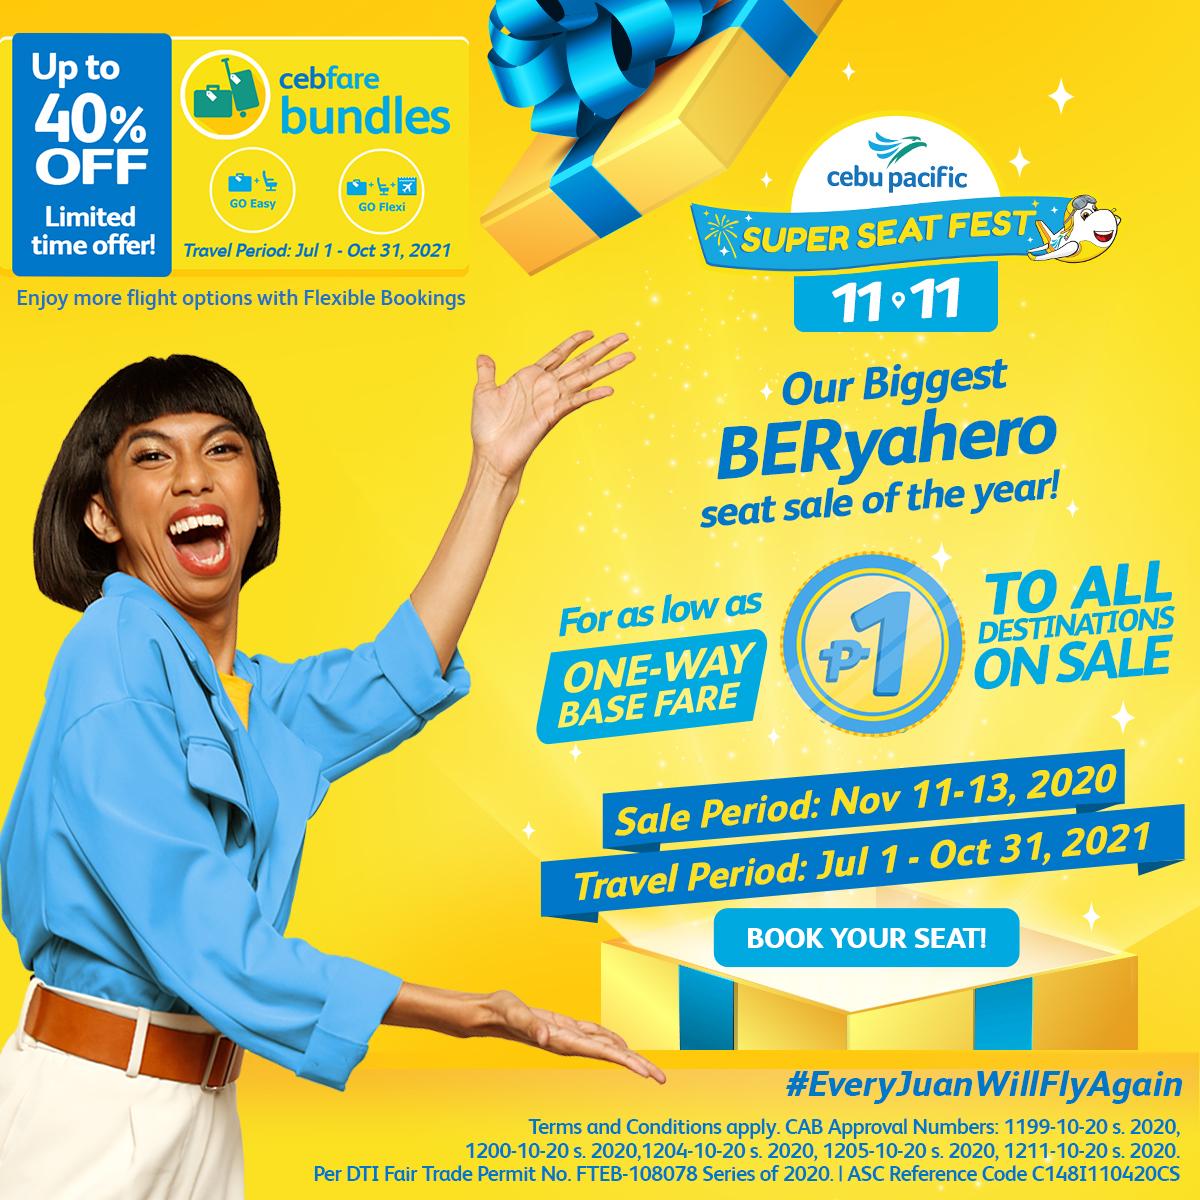 Cebu Pacific Seat Sale 11.11 November 11, 2020